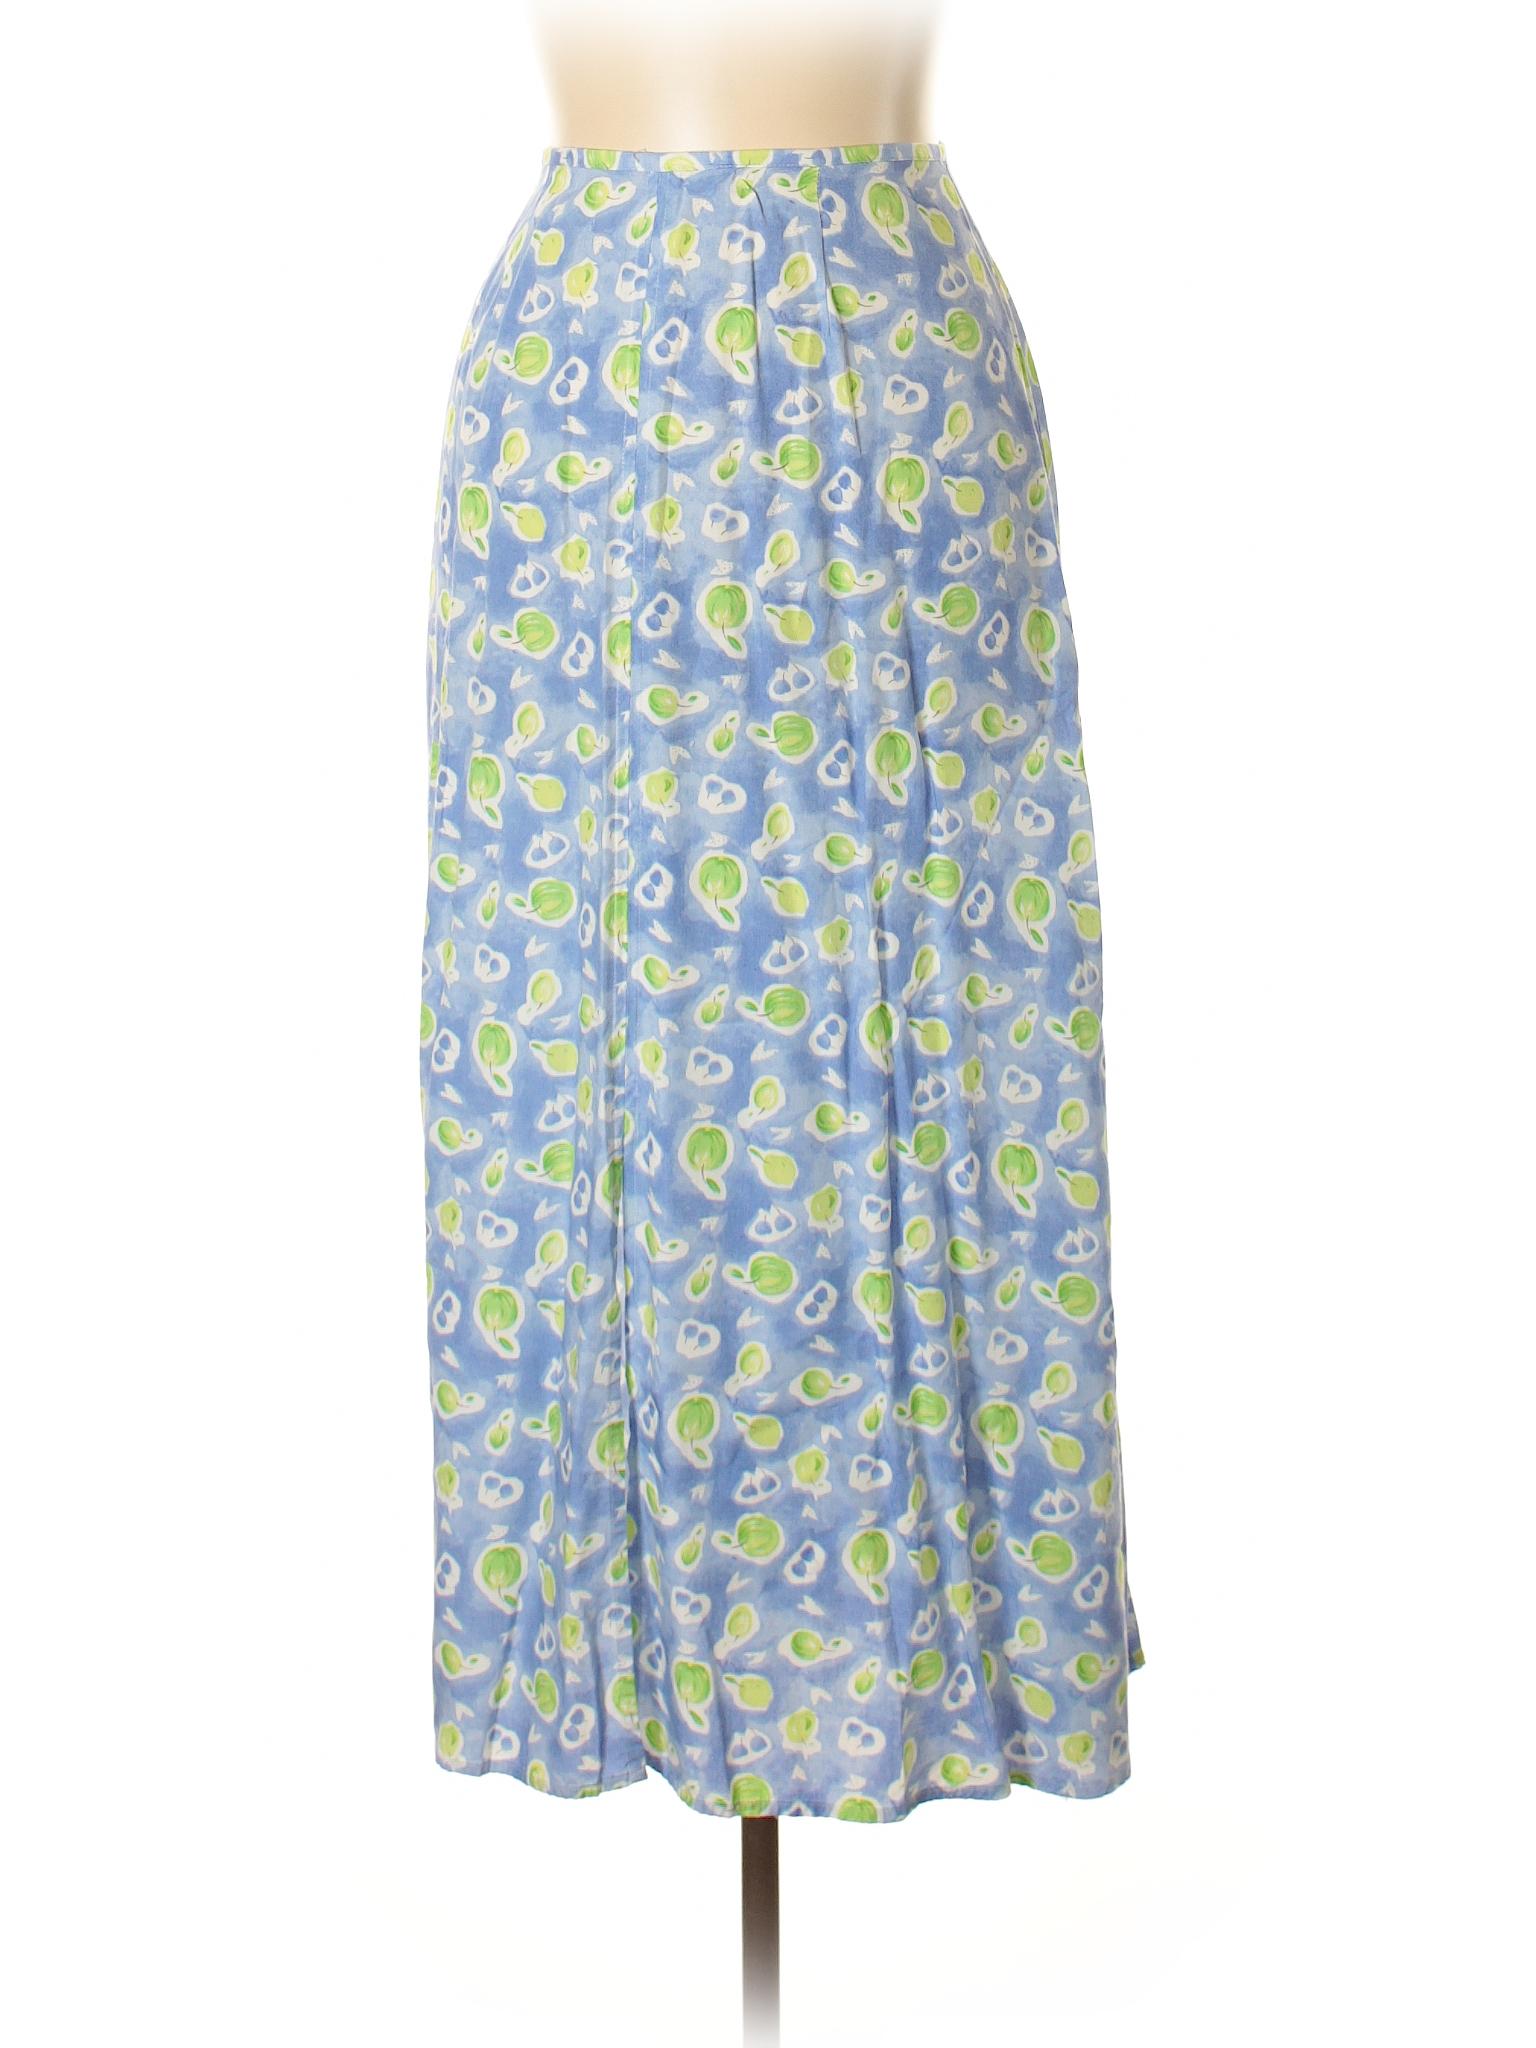 Boutique Casual Casual Boutique Skirt Skirt Boutique Casual zPwTrxzf